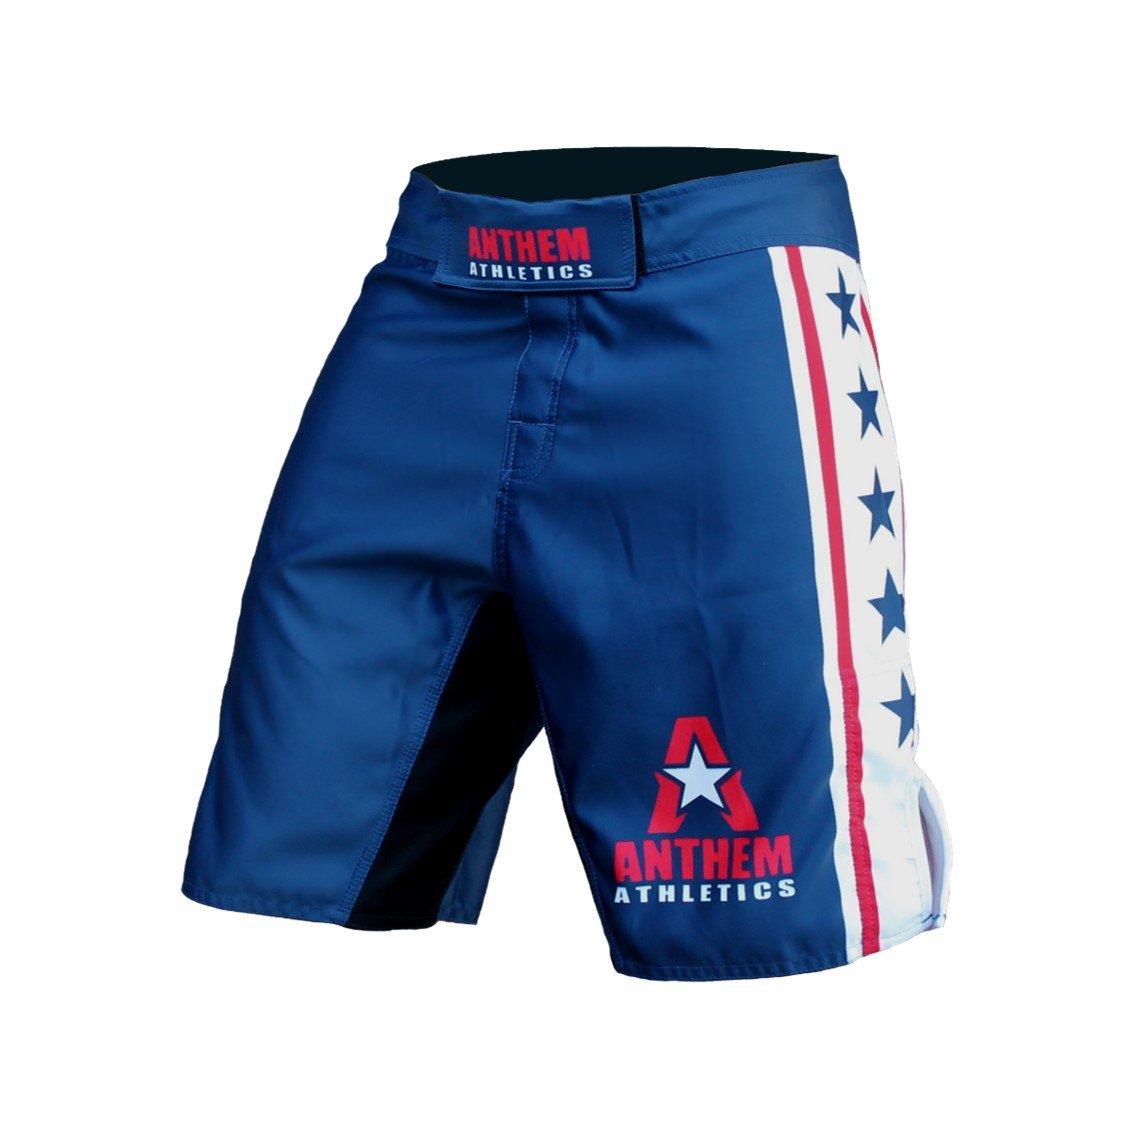 Anthem Athletics レジリエンス ファイトショーツ - 10種類以上のスタイル - MMA BJJ WOD B0192BRHJE 36